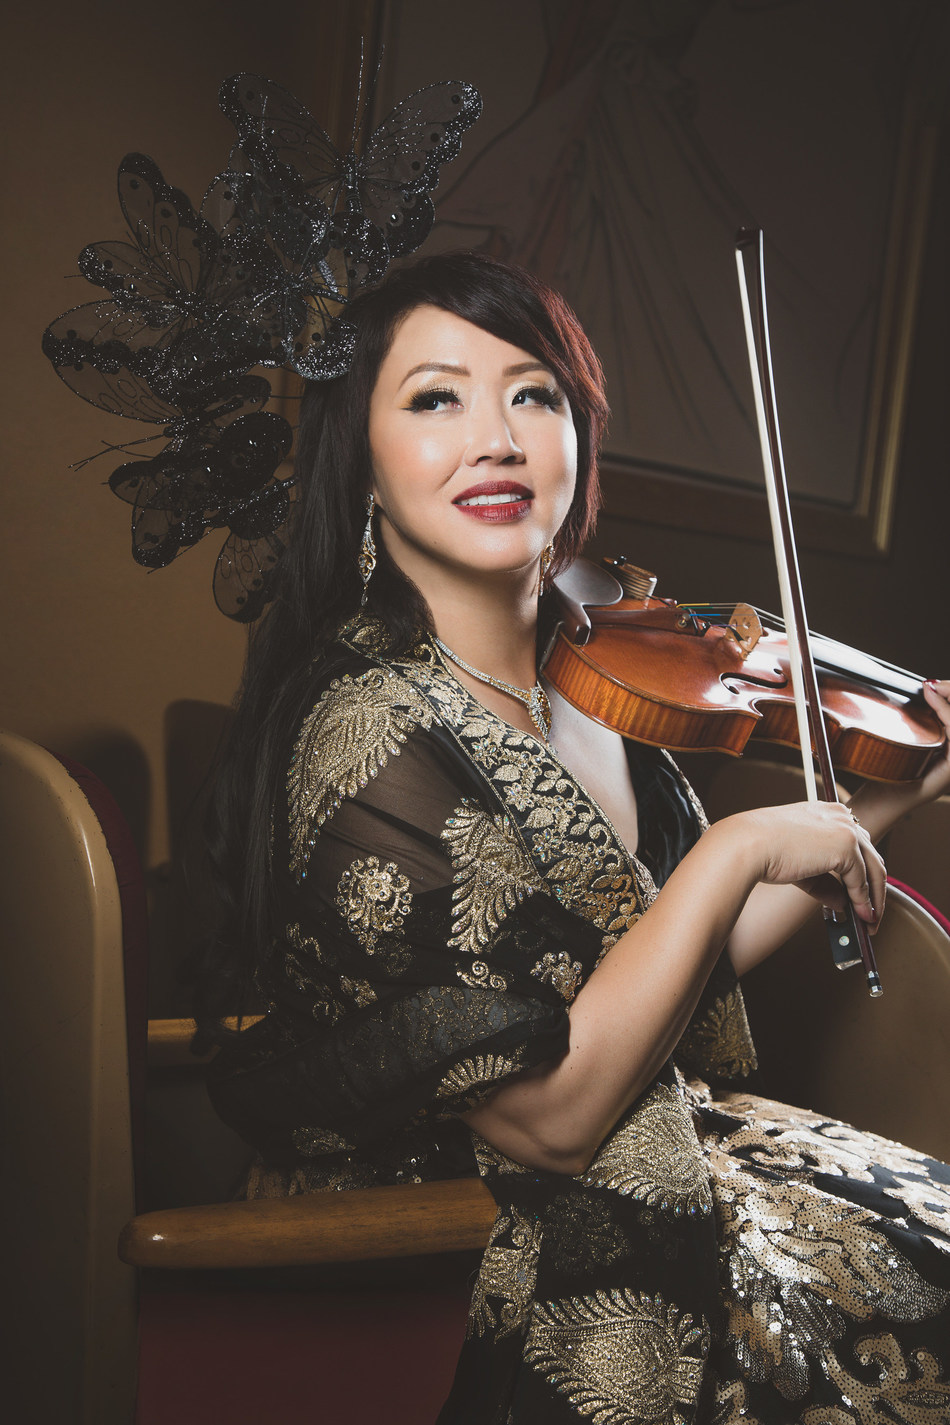 Virtuoso violinist and vocalist Maki Mae.